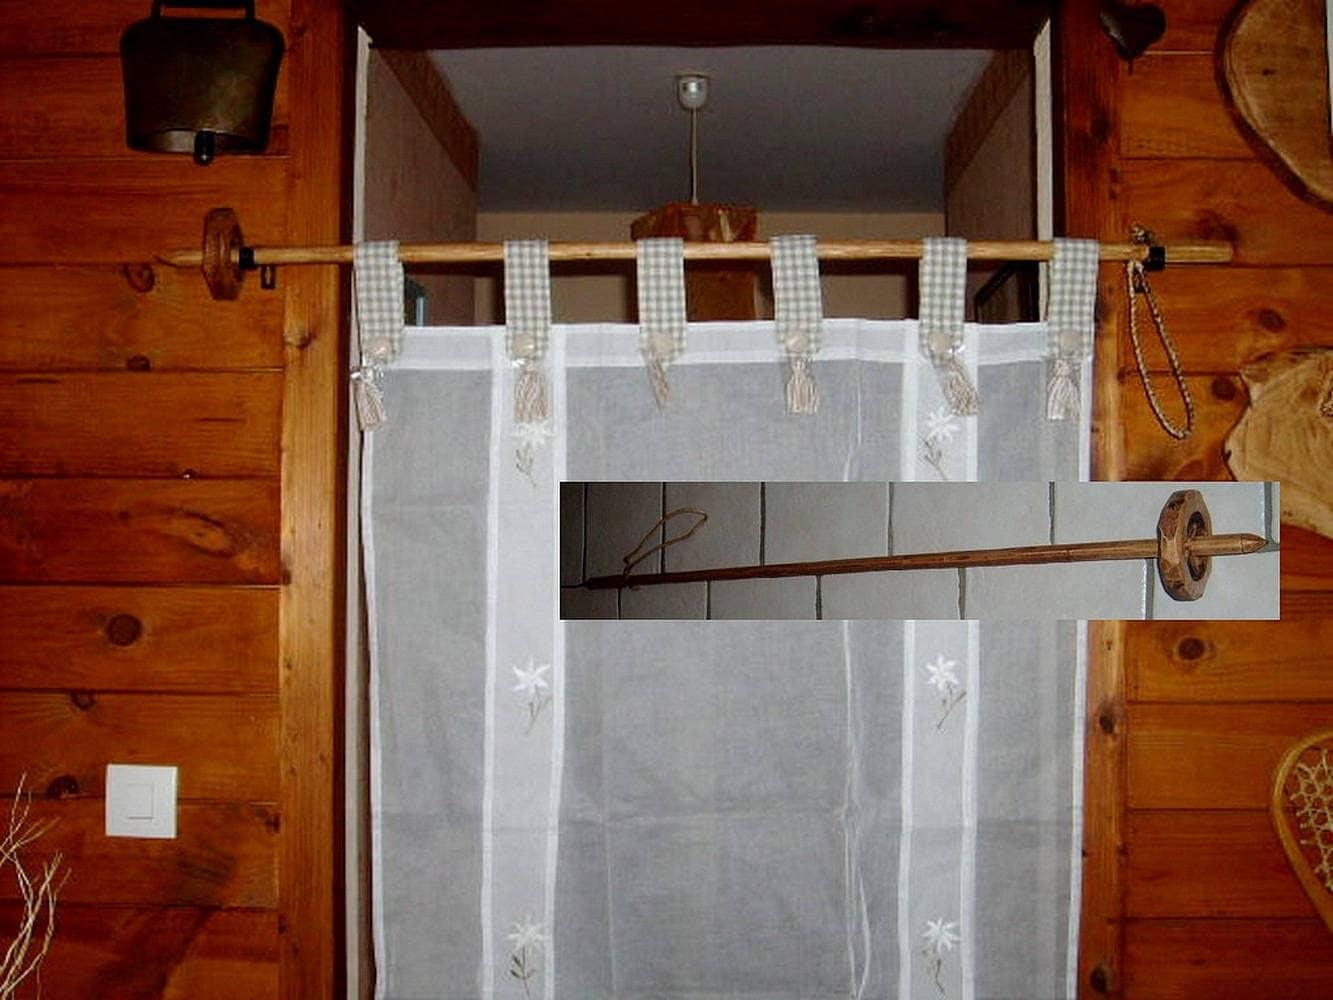 tringle rideau b ton de ski artisanal en bois 100 etsy. Black Bedroom Furniture Sets. Home Design Ideas